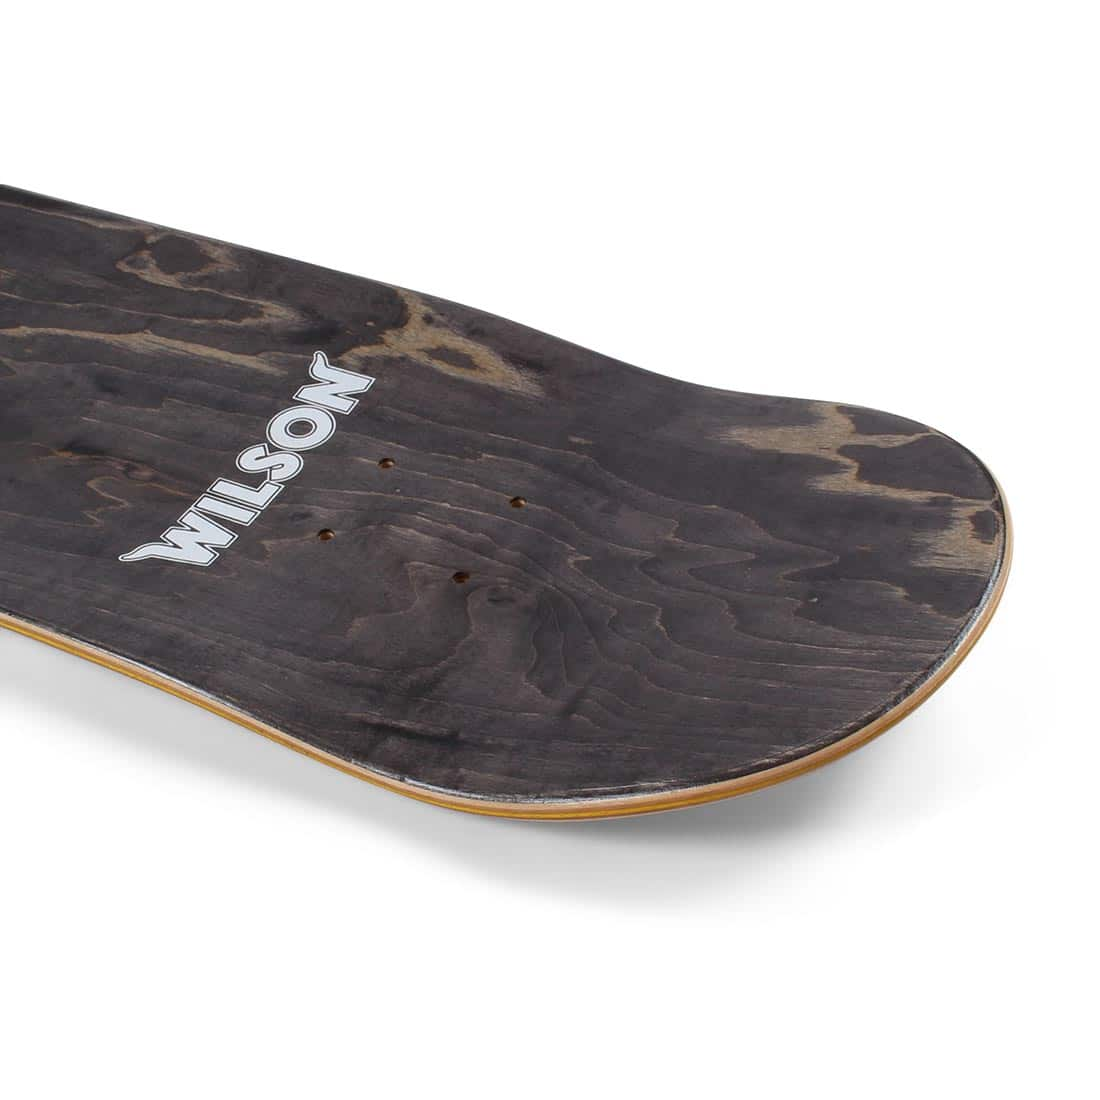 "Quasi Skateboards Josh Wilson ""Safe"" Two 8.5"" Deck - Blue"